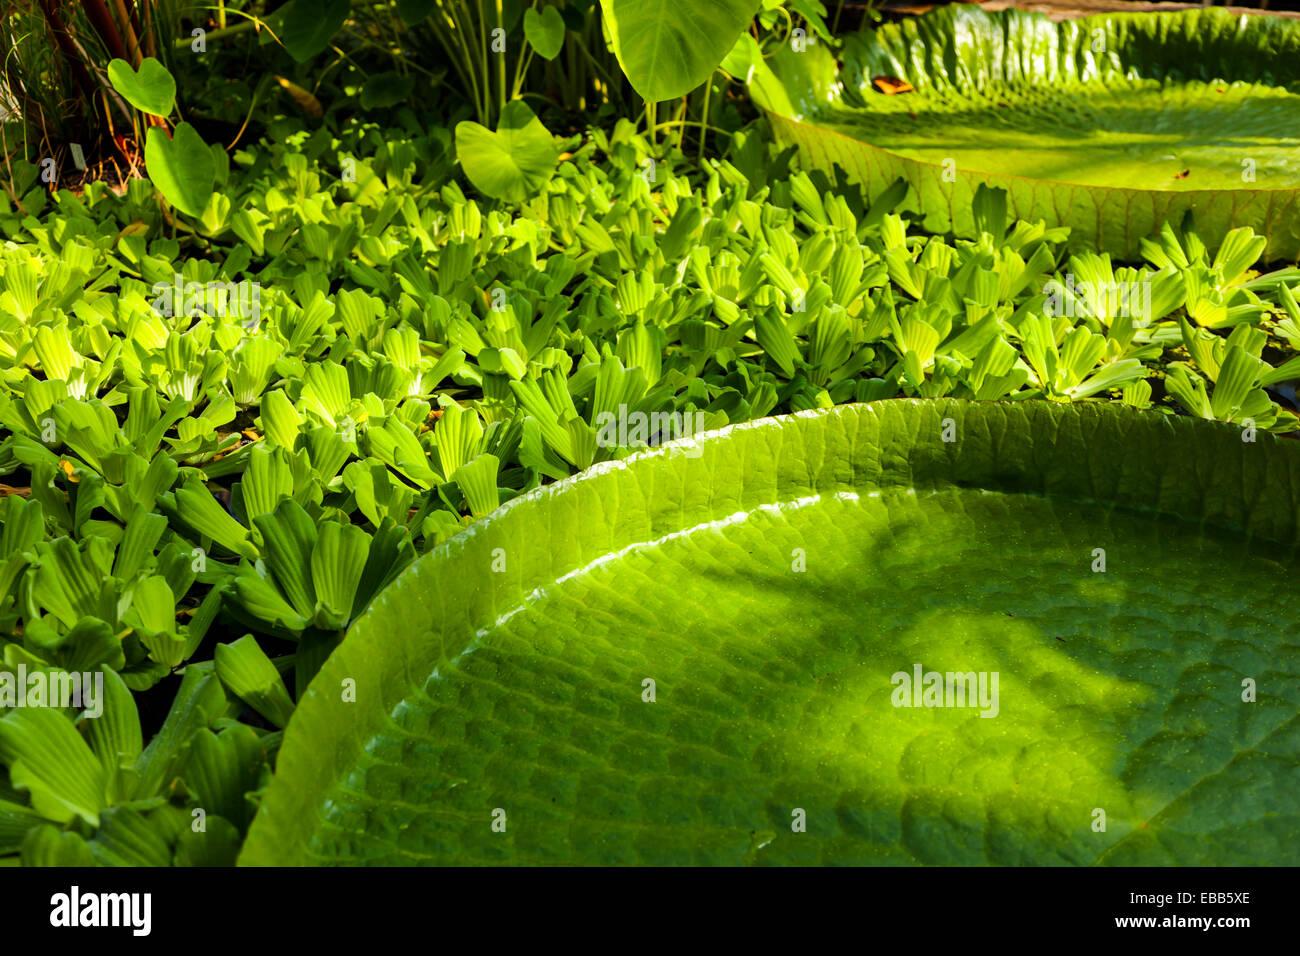 Victoria amazonica hoja de lirio gigante Imagen De Stock